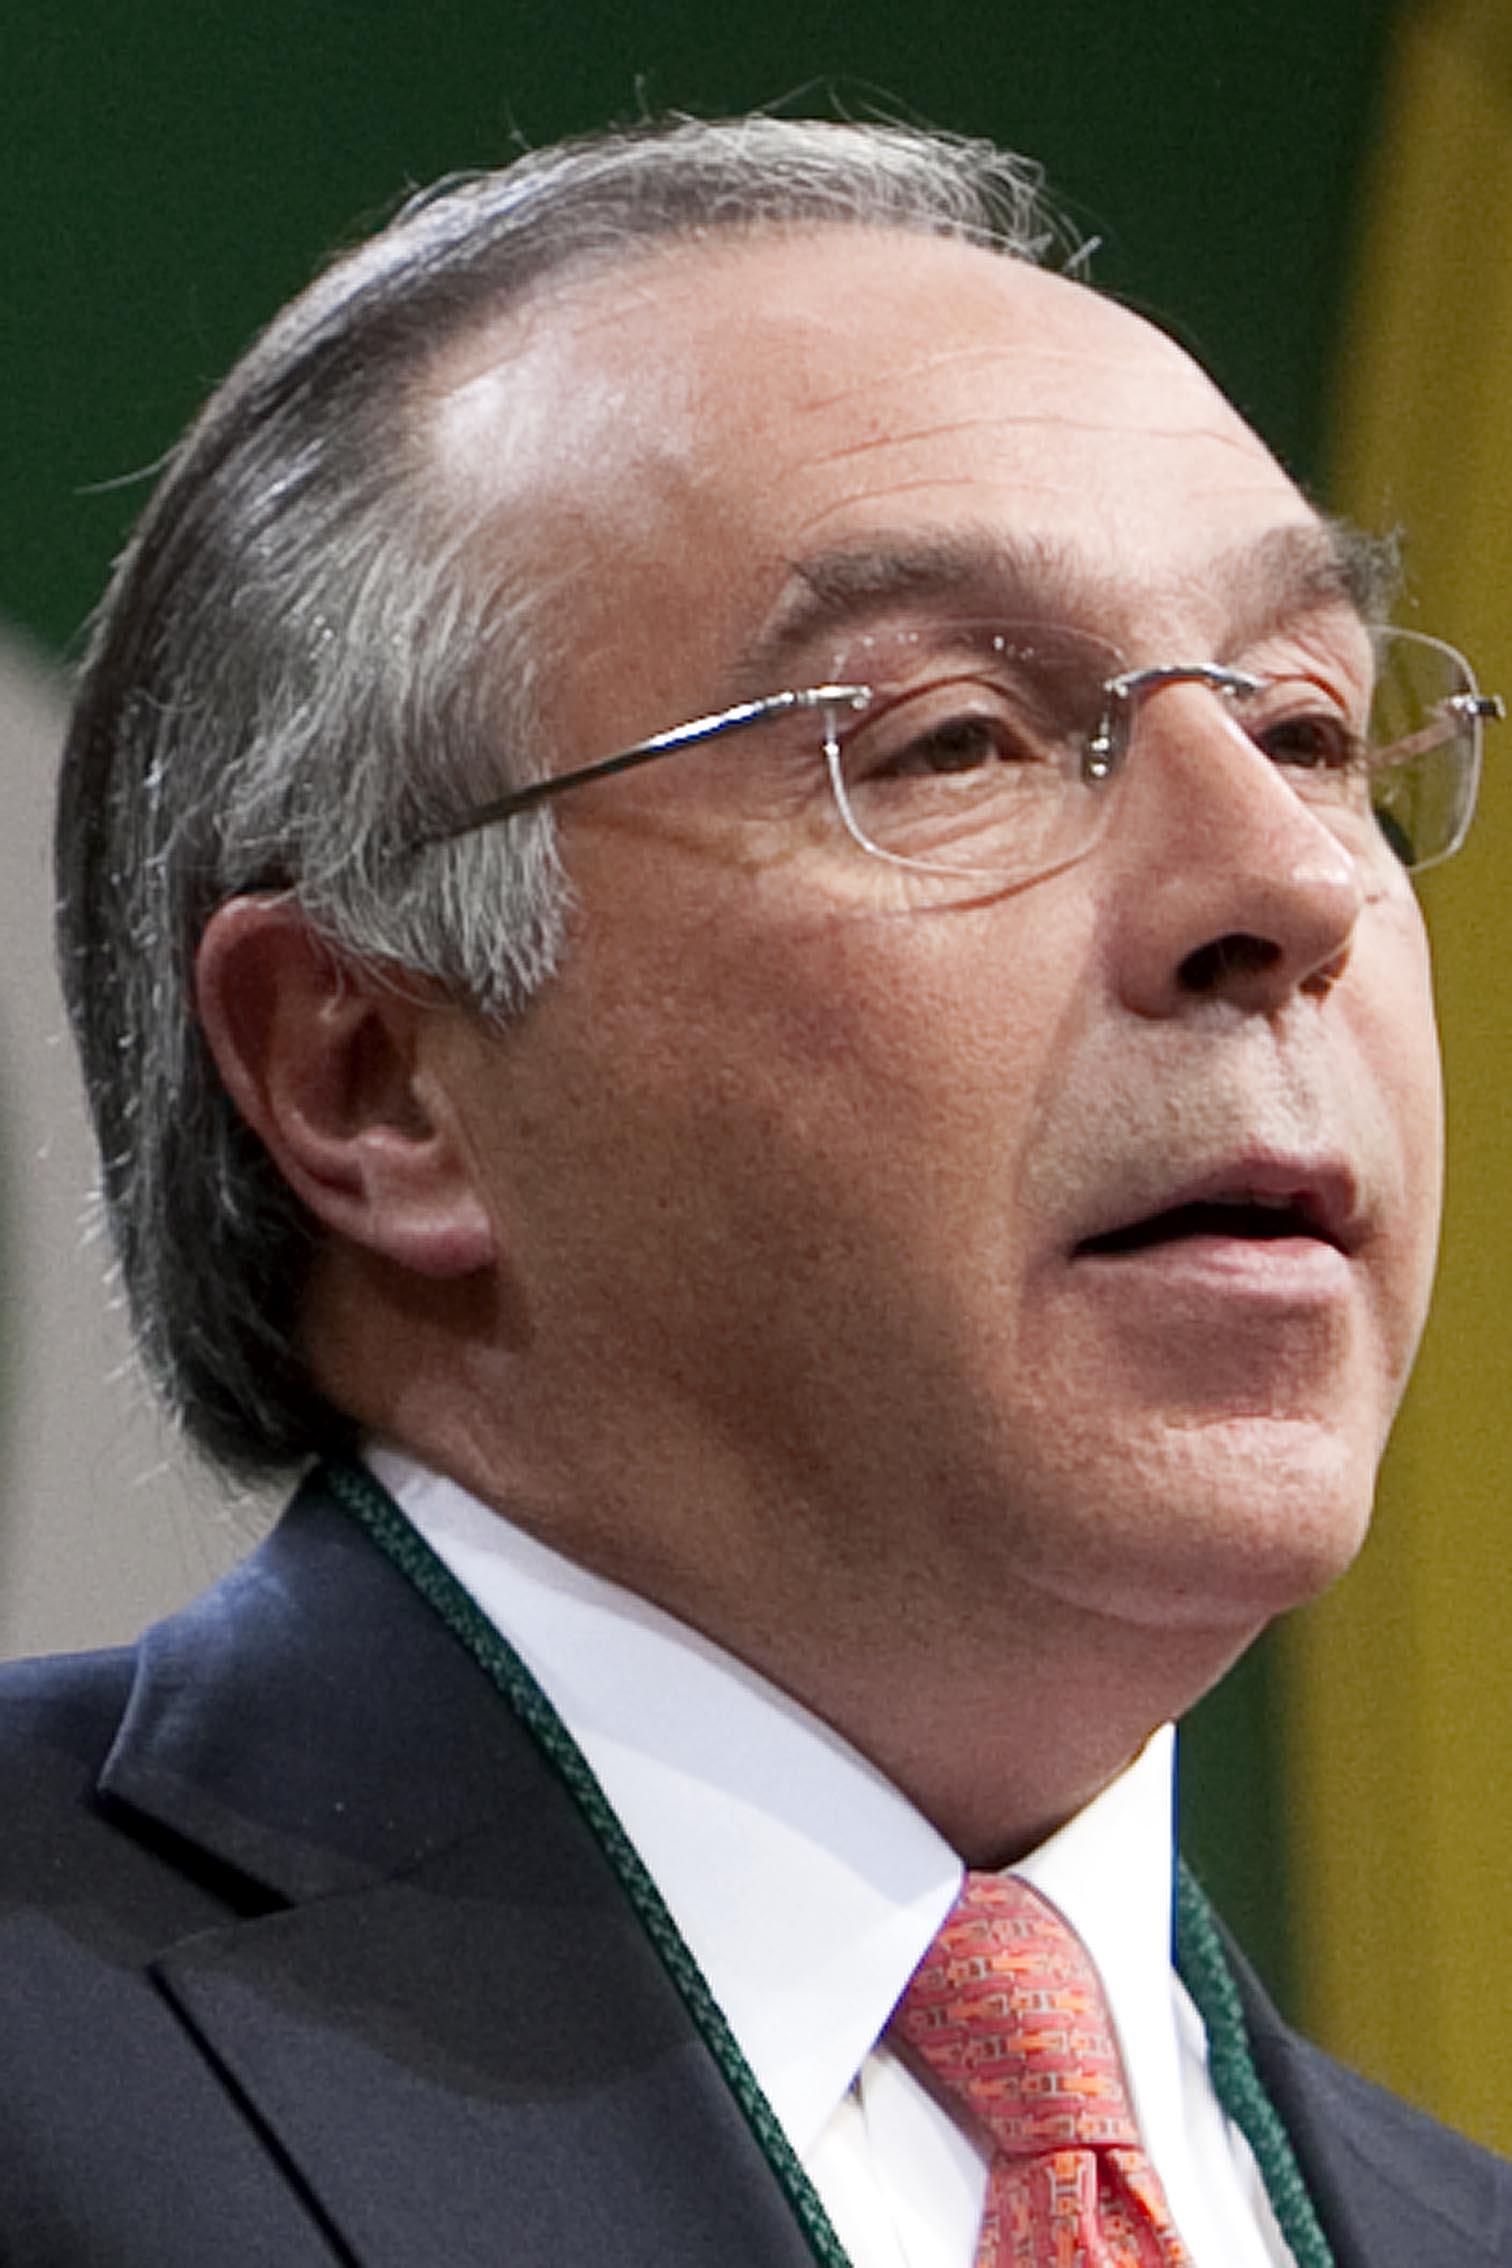 PÚBLICO - Marques Mendes antecipa crescimento do PIB acima dos 1,2% previstos